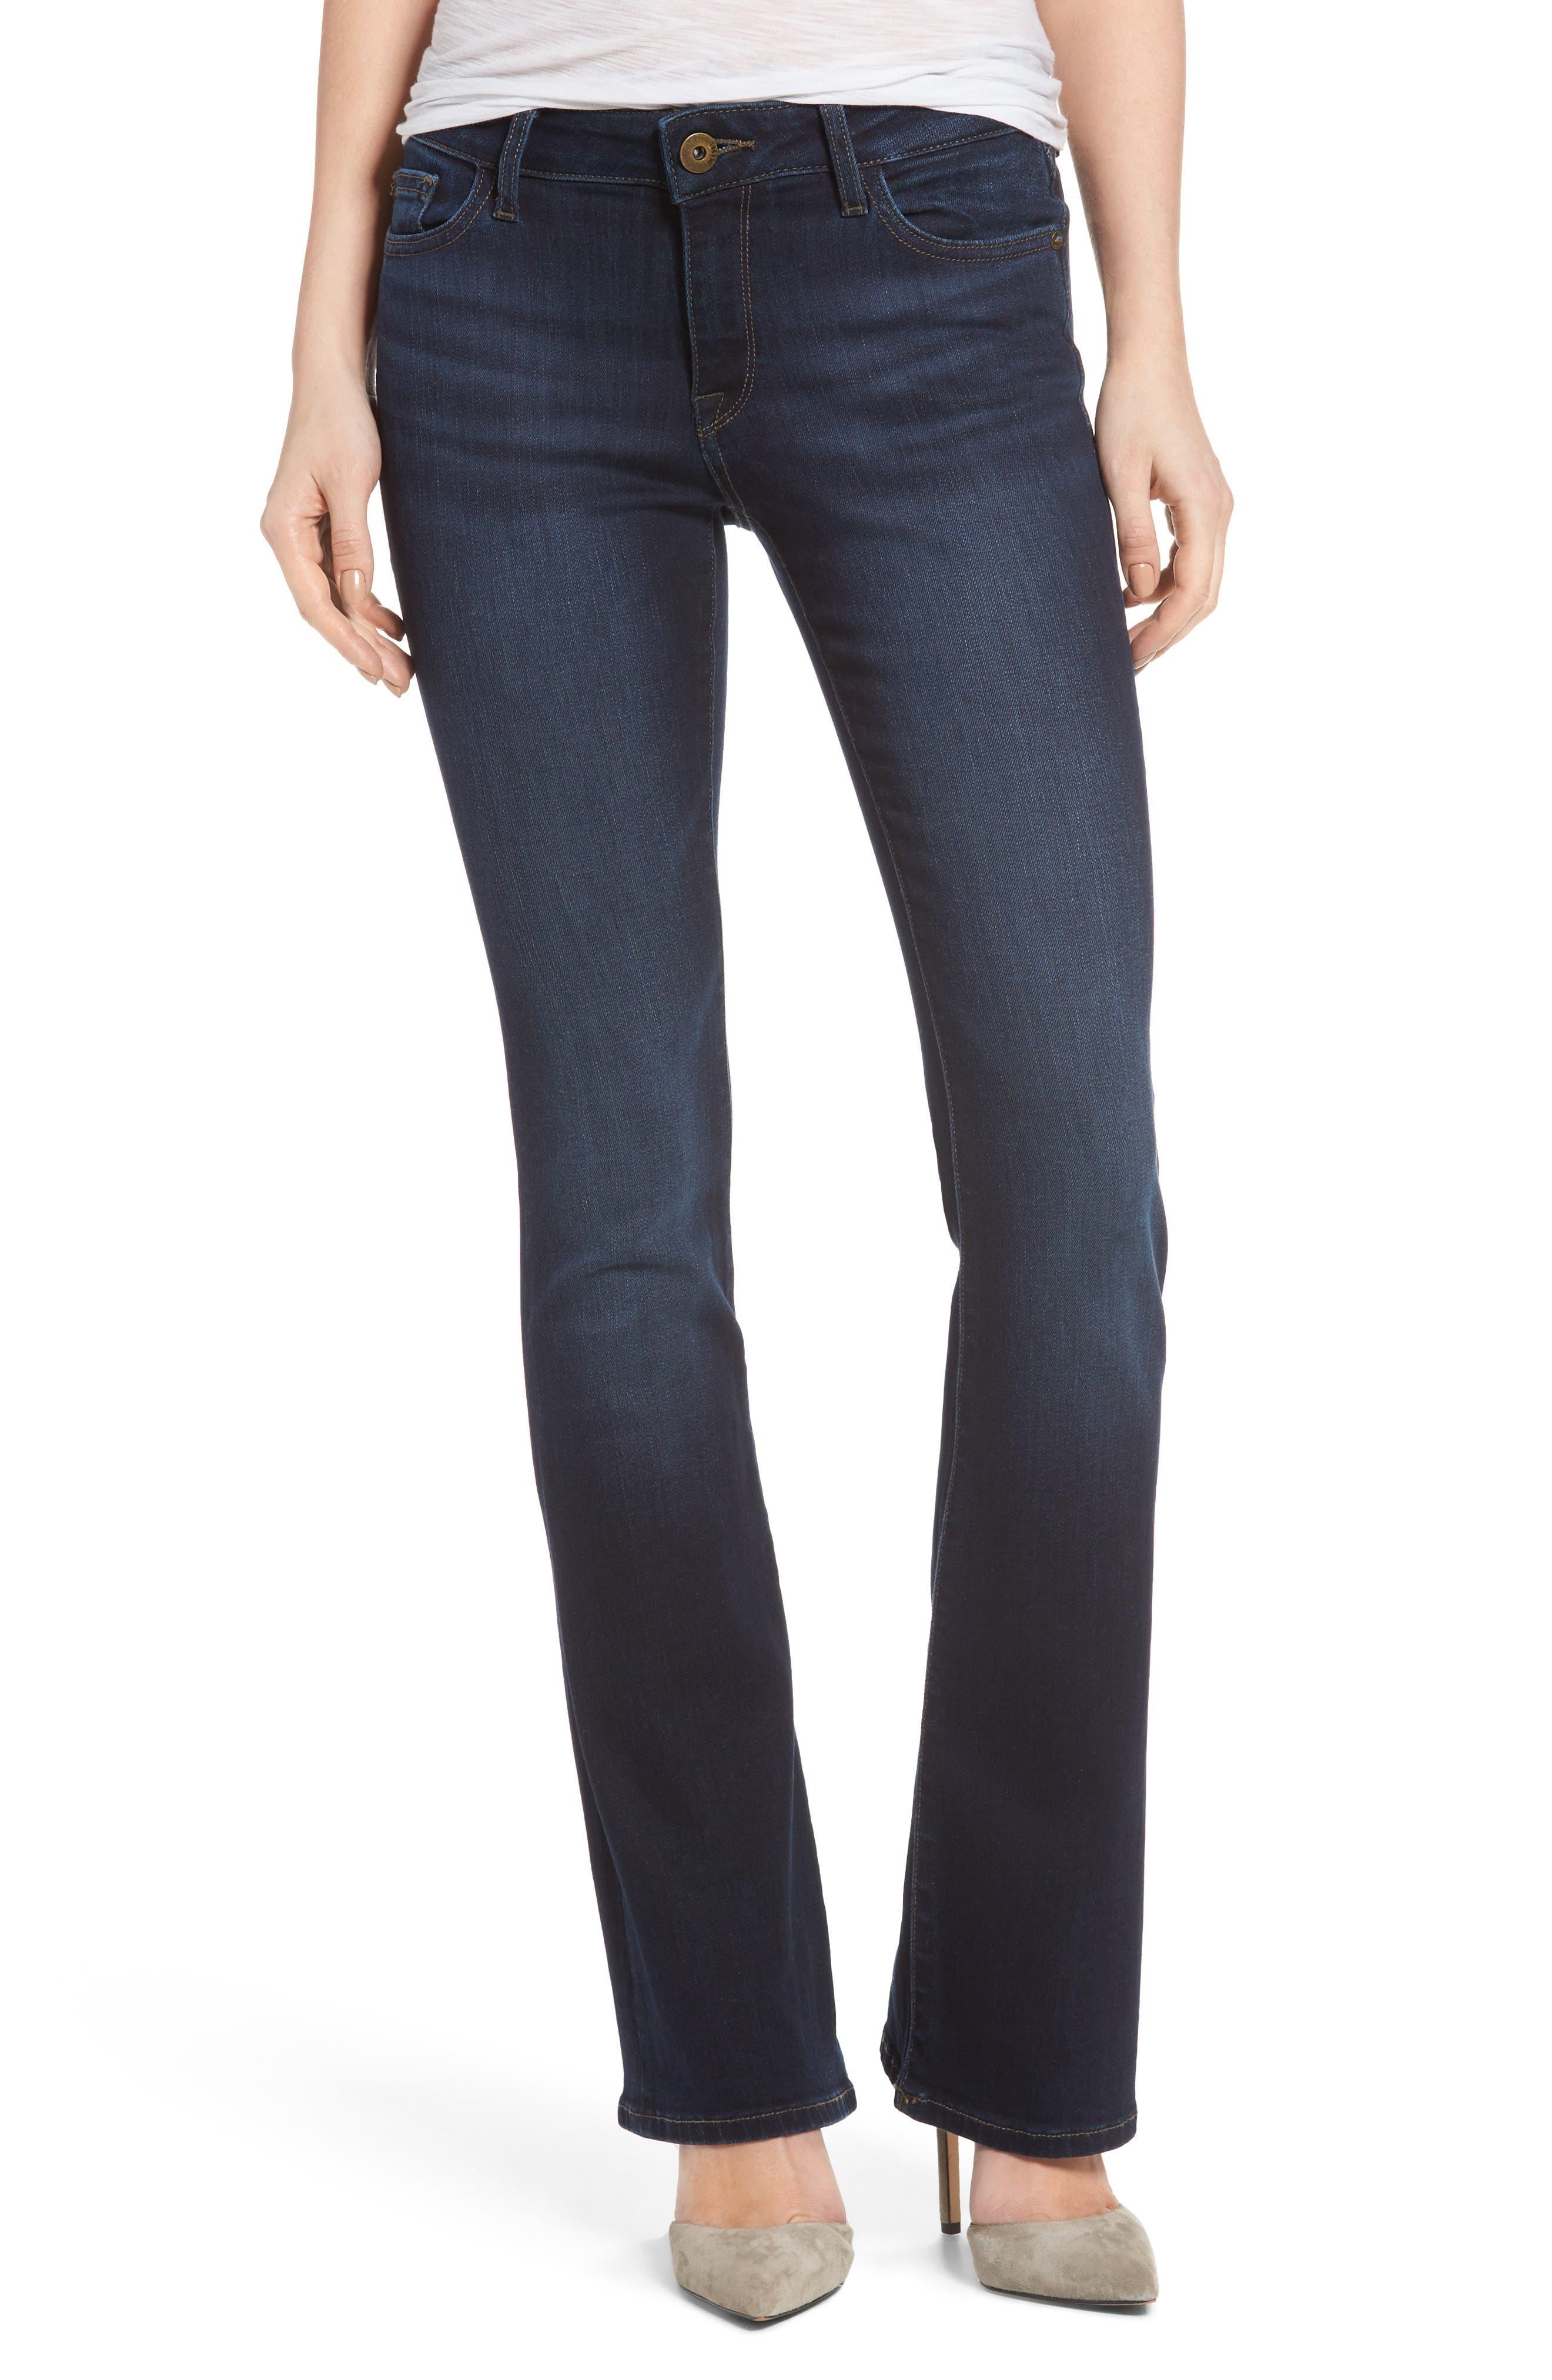 DL1961 Bridget Bootcut Jeans (Peak)